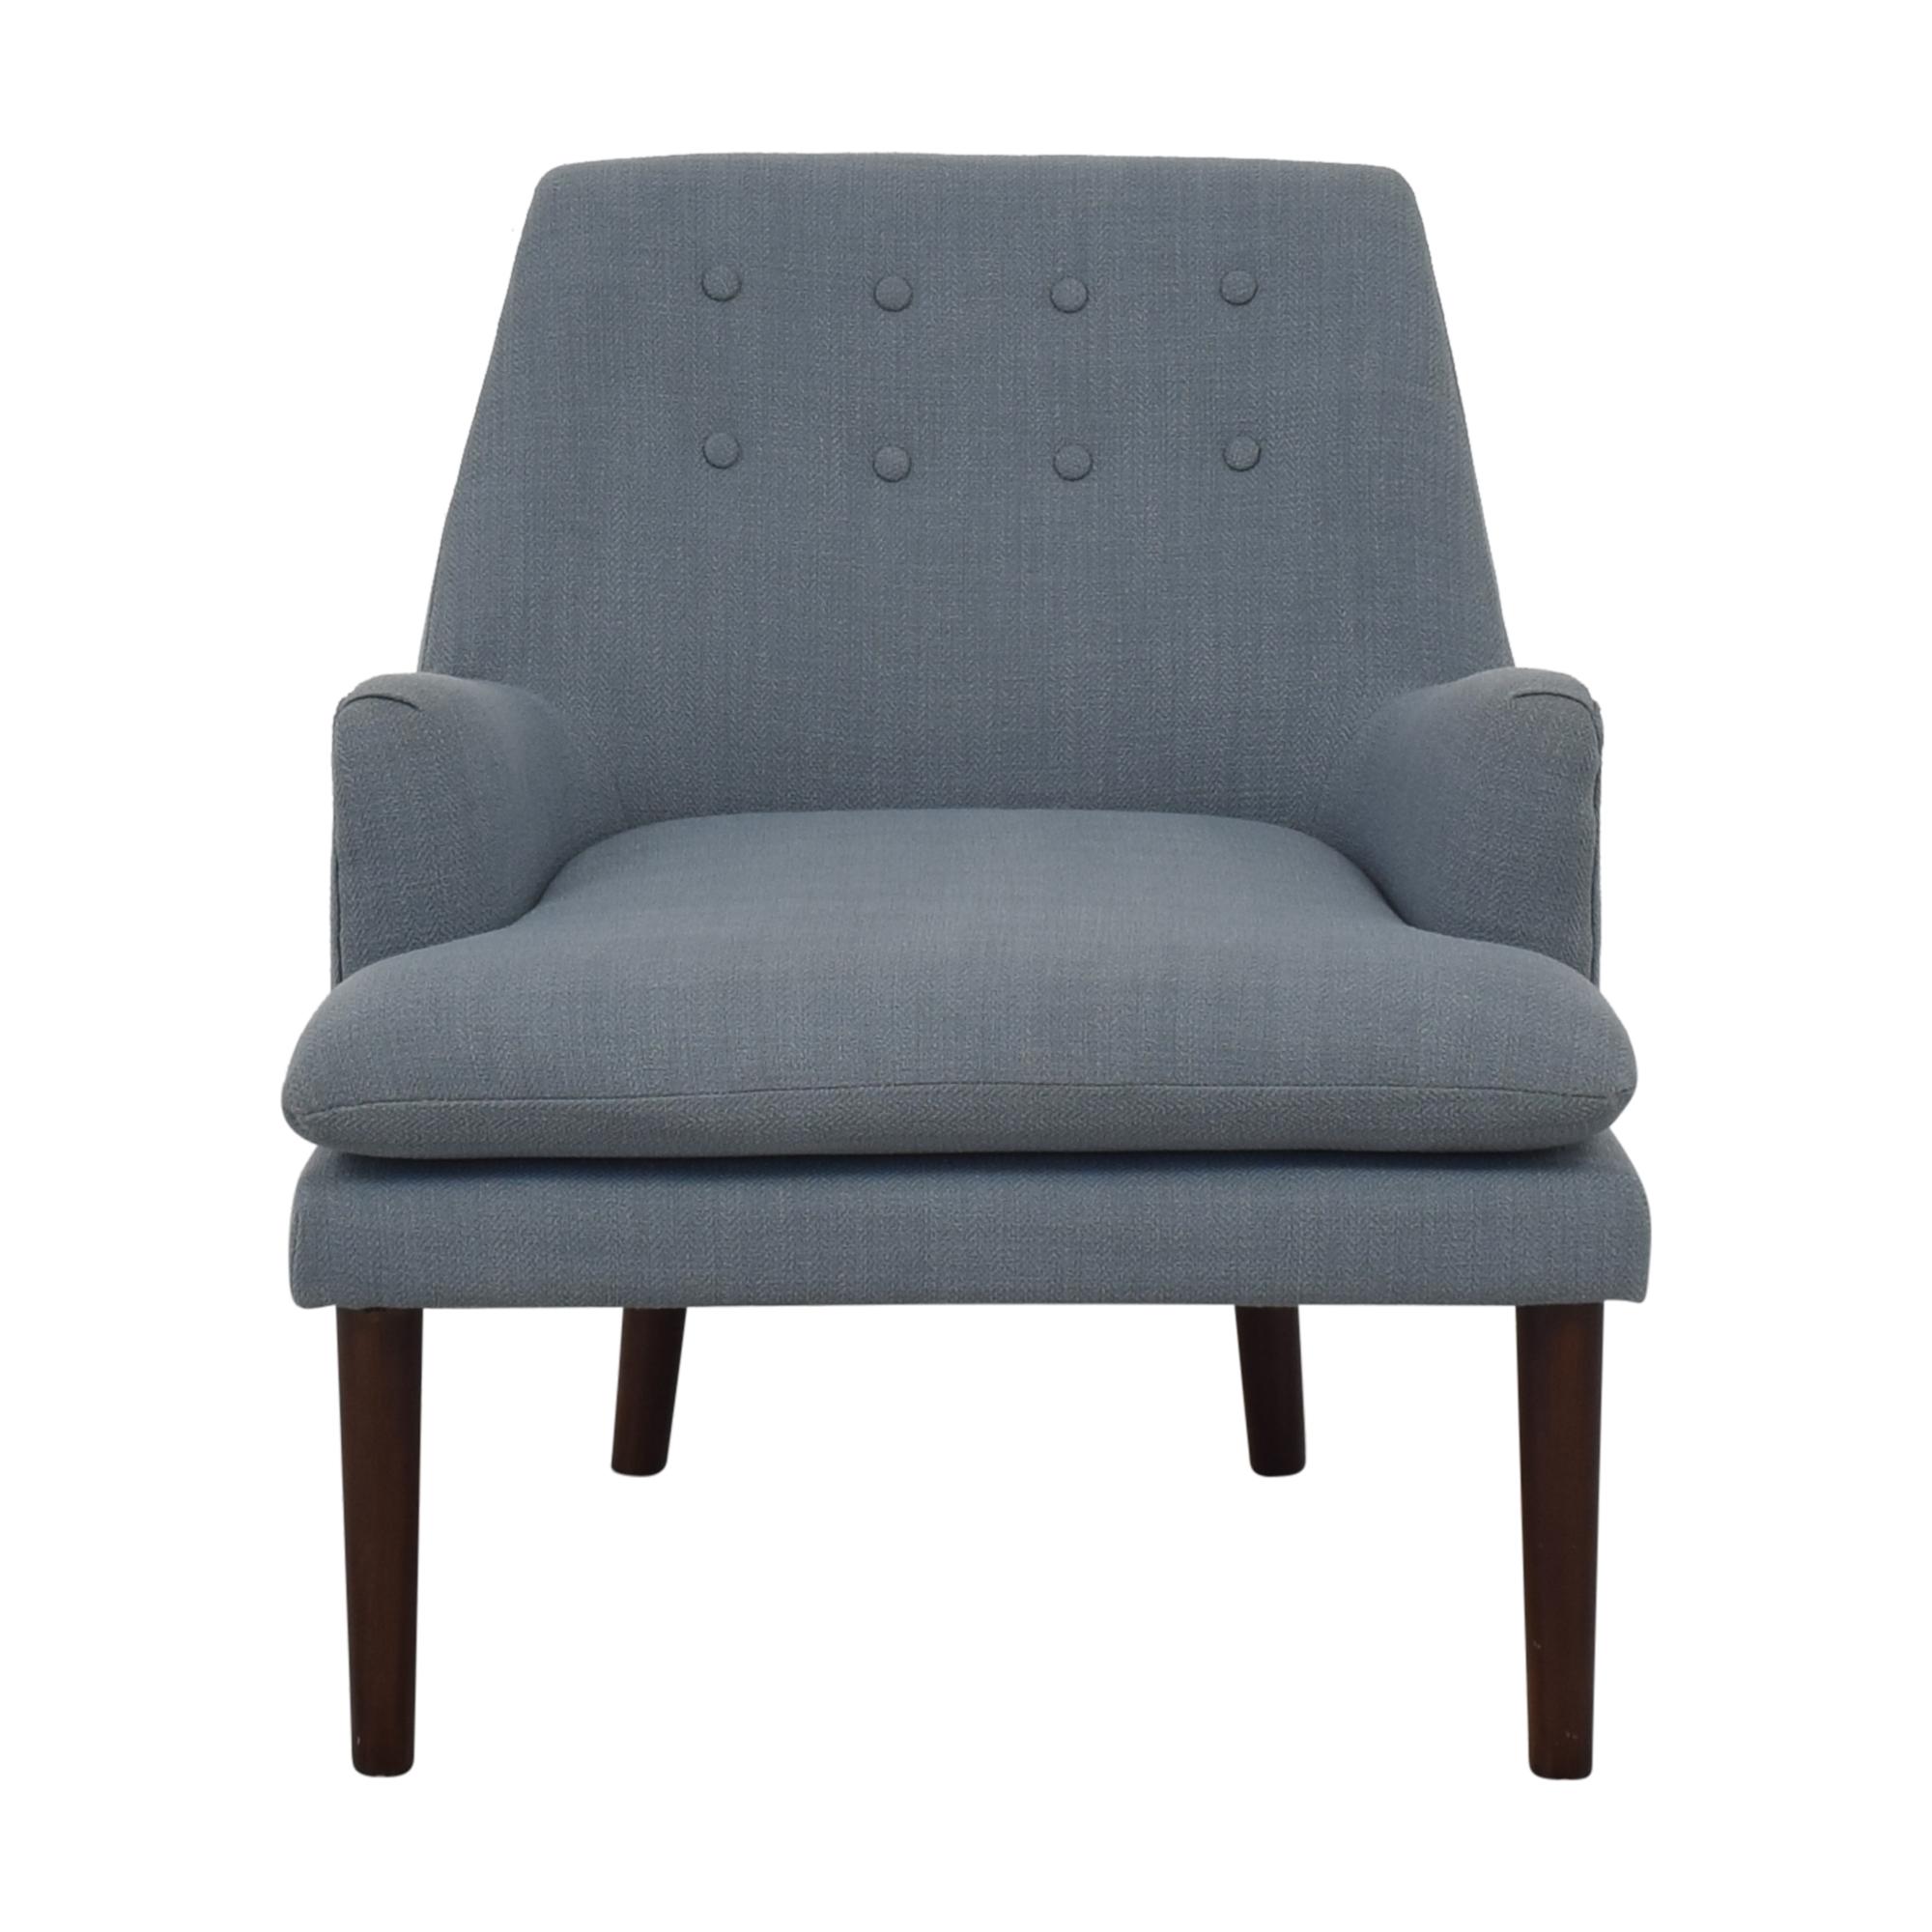 E&E Co E&E Mid-Century Modern Arm Chair second hand